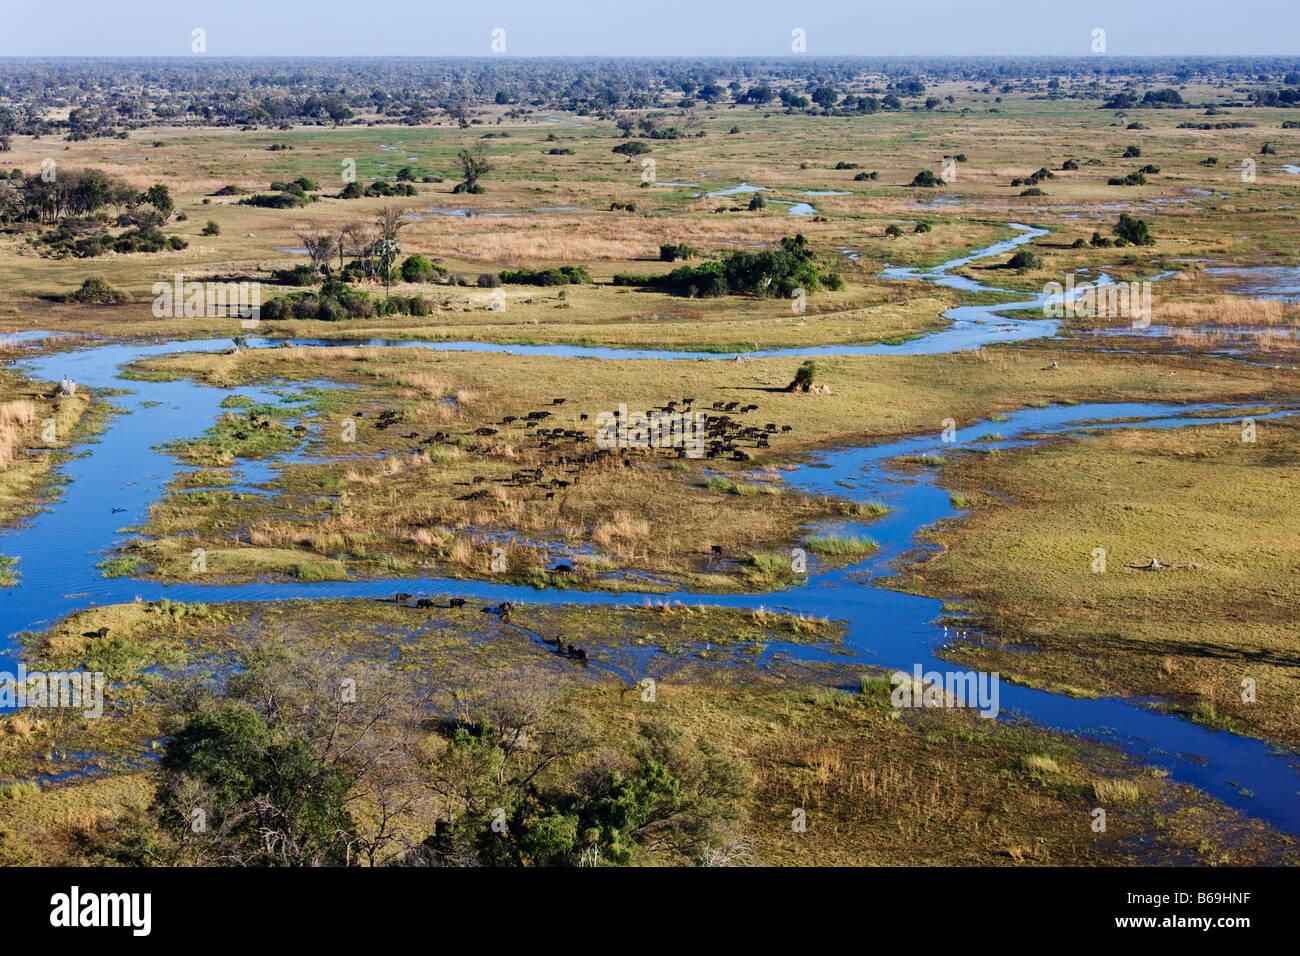 Aerial view of Cape Buffalo over the Okavango Delta botswana - Stock Image